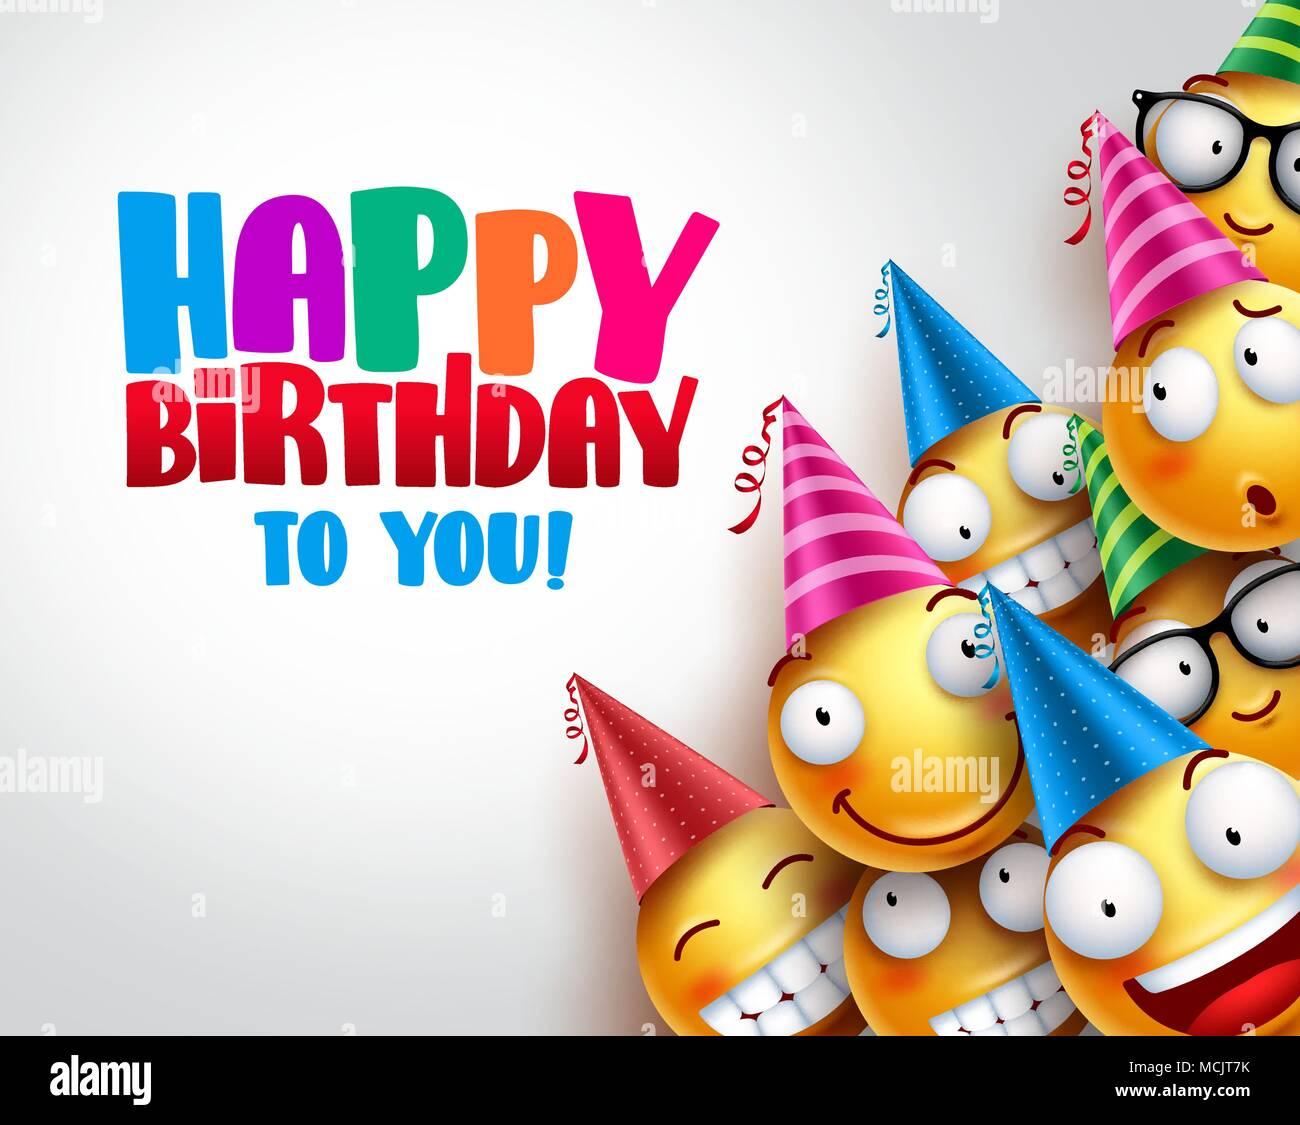 Geburtstag Smiley